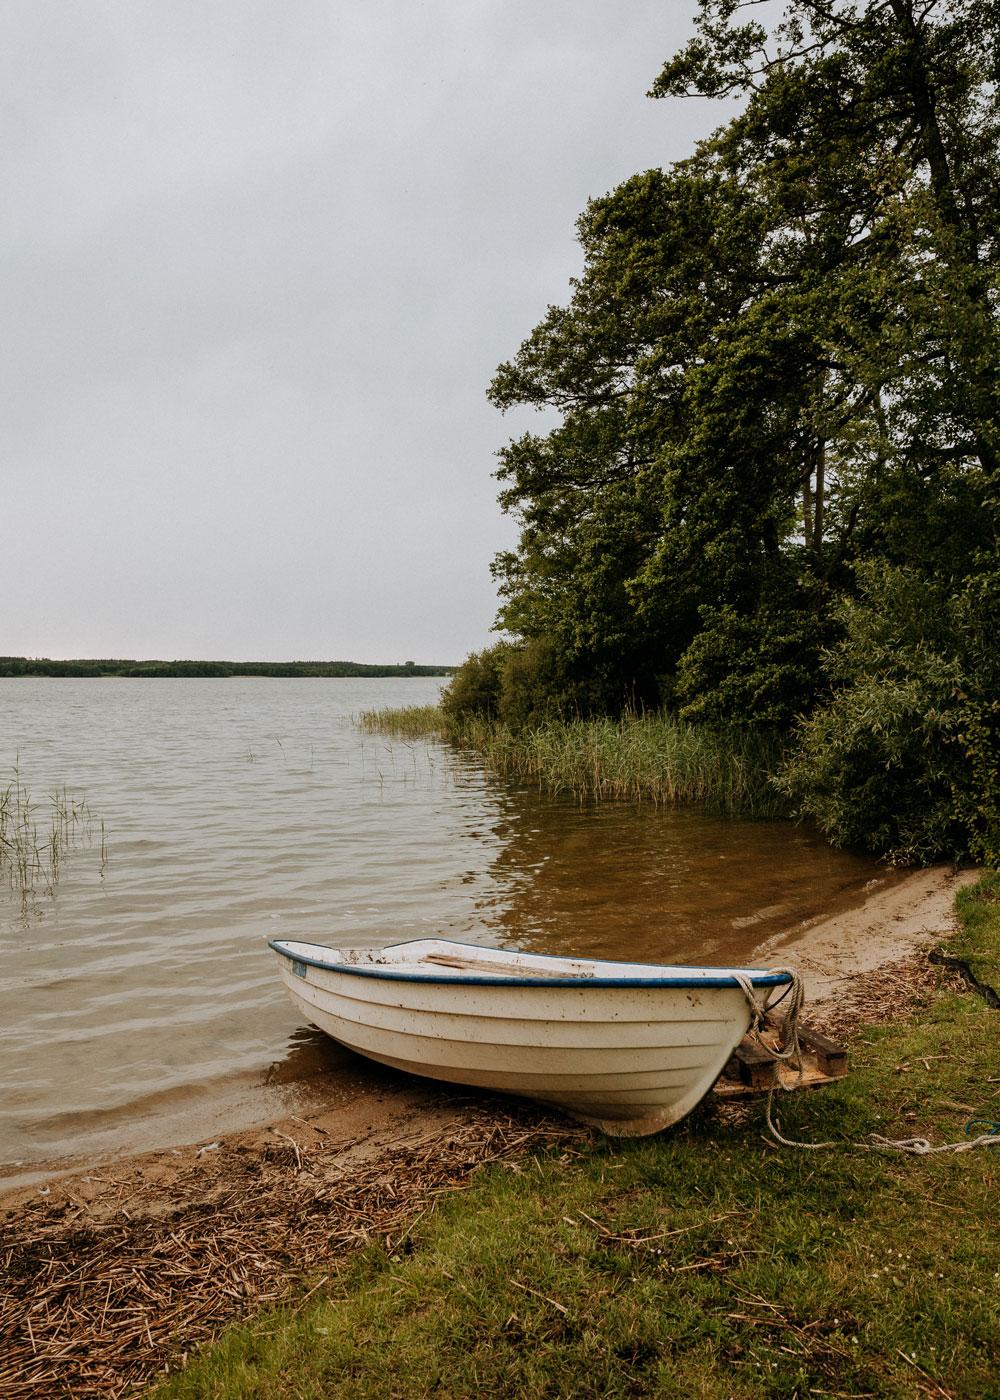 Boat at Bäckaskog Castle in Skåne